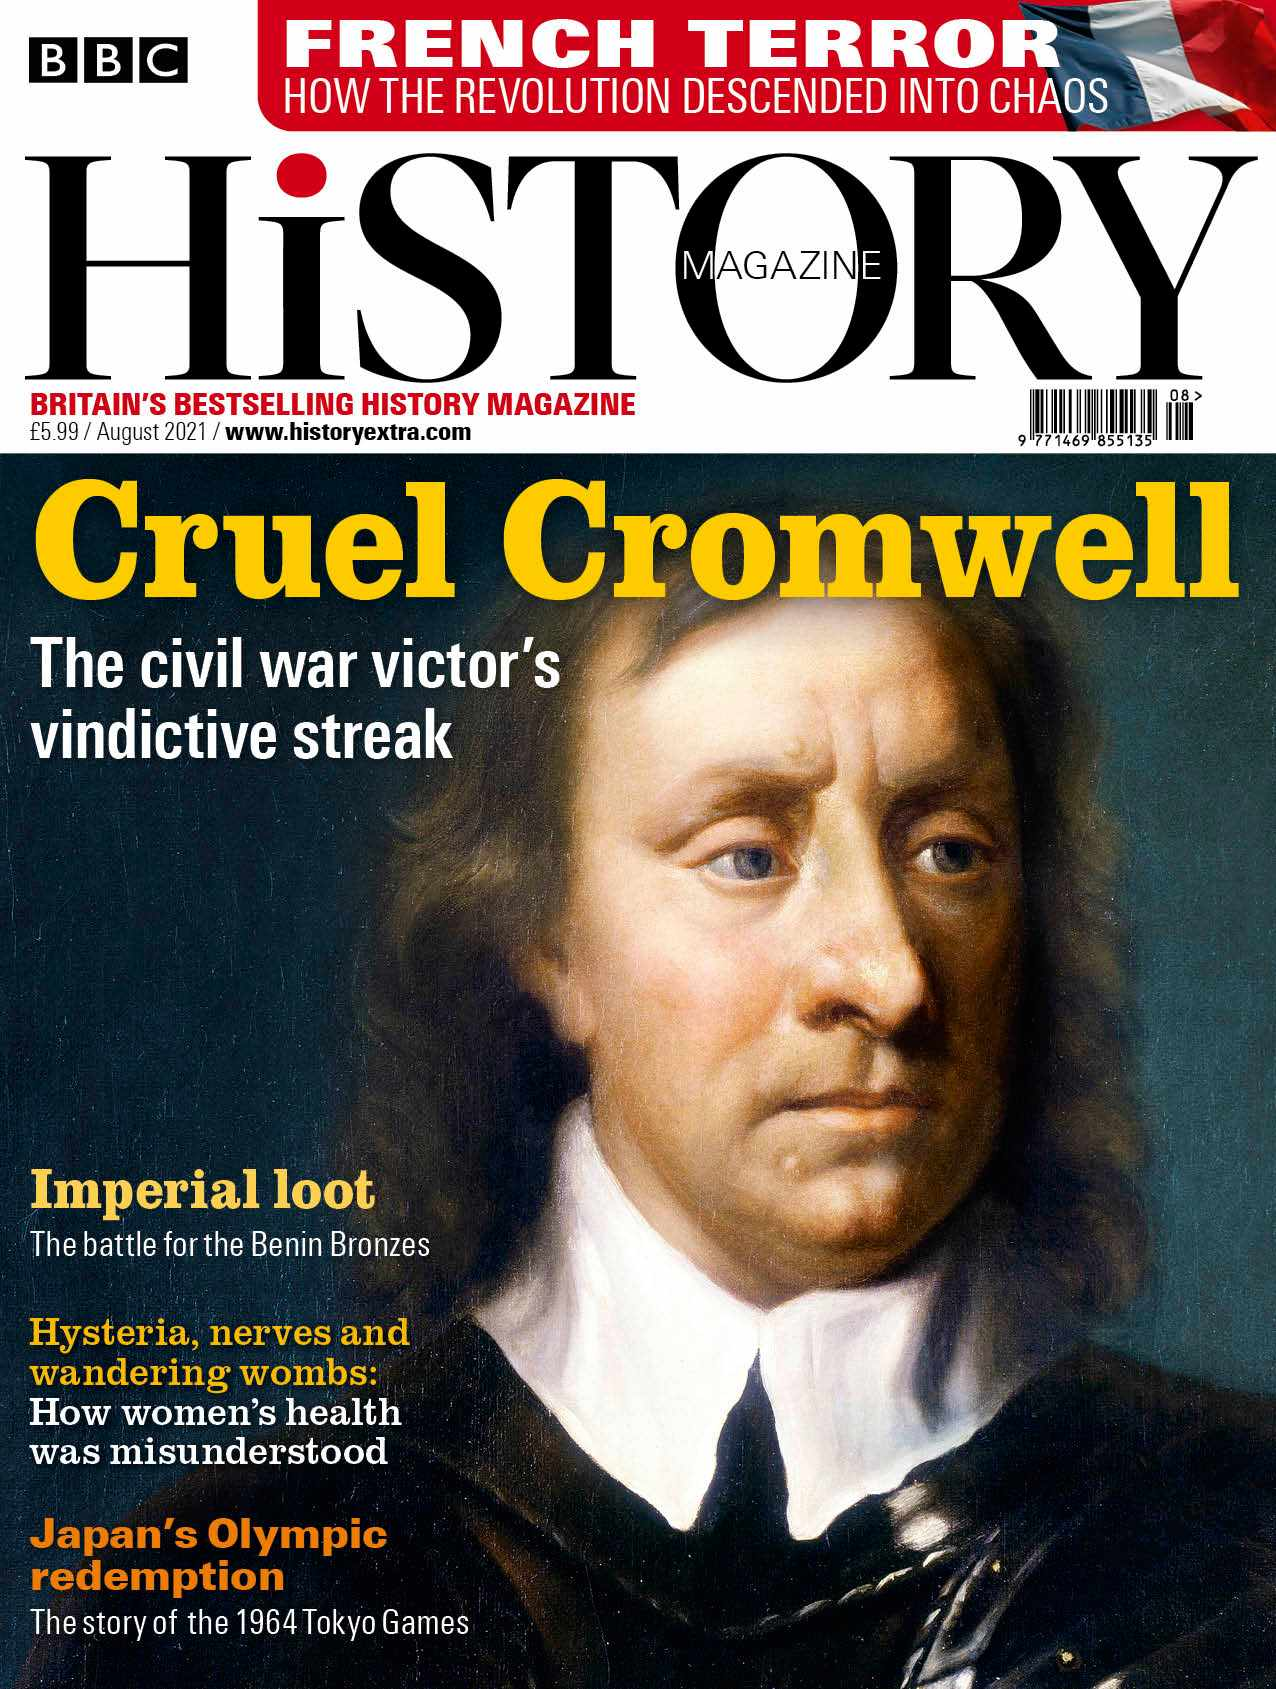 BBC History Magazine August 2021